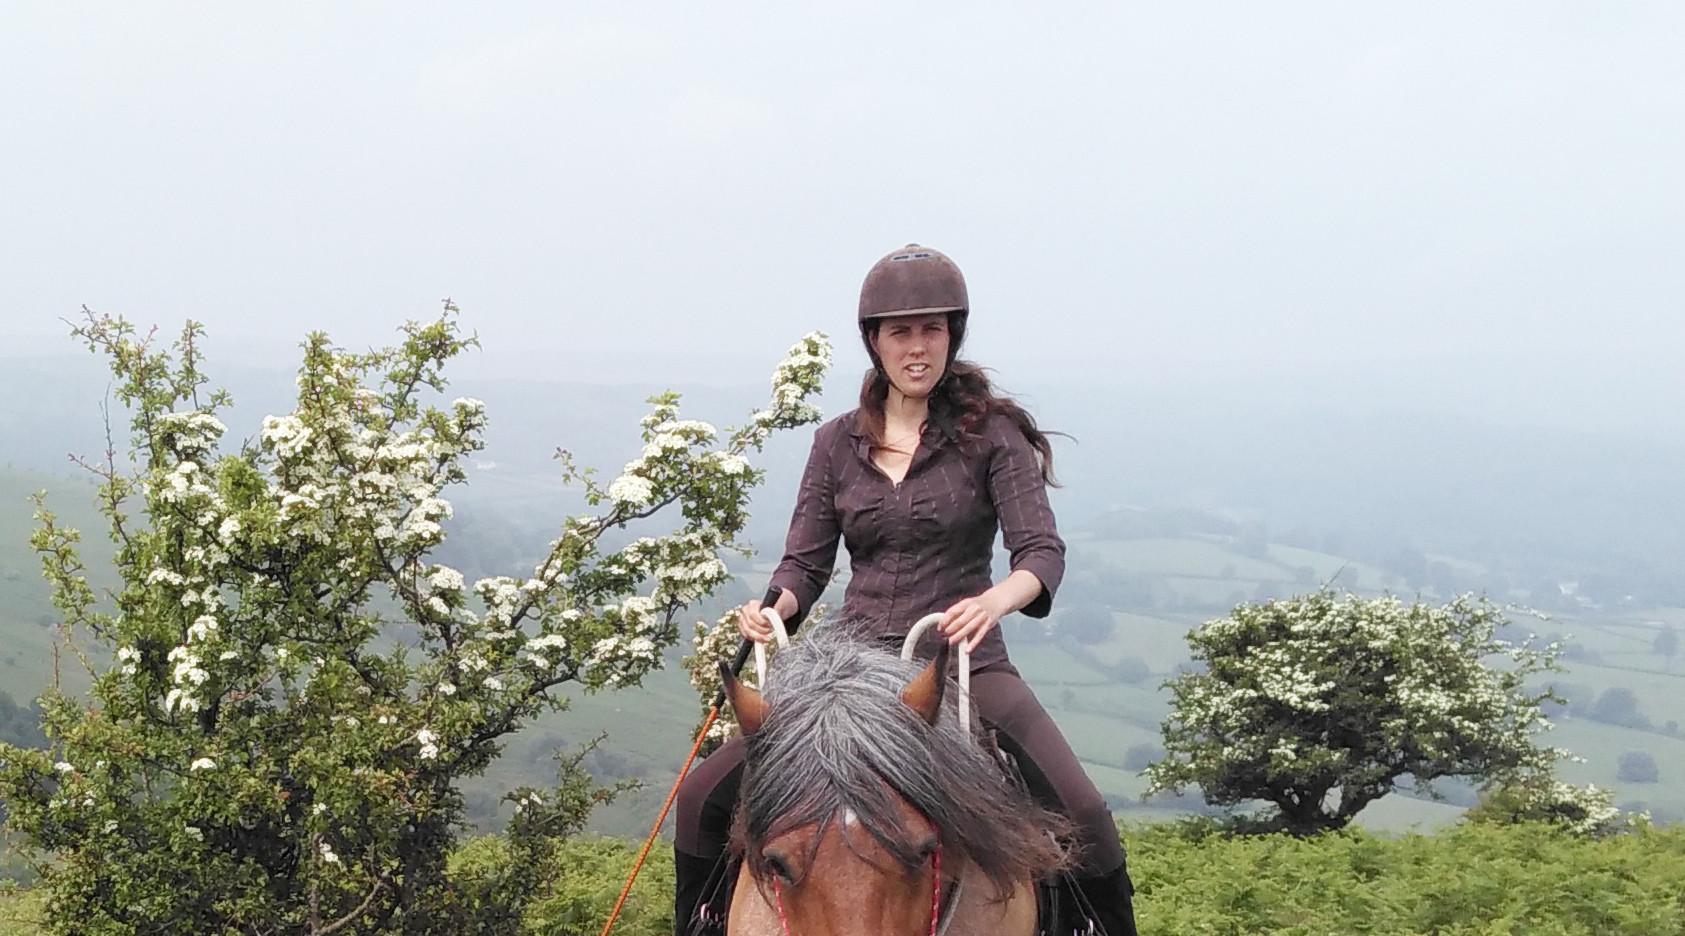 Riding naturally